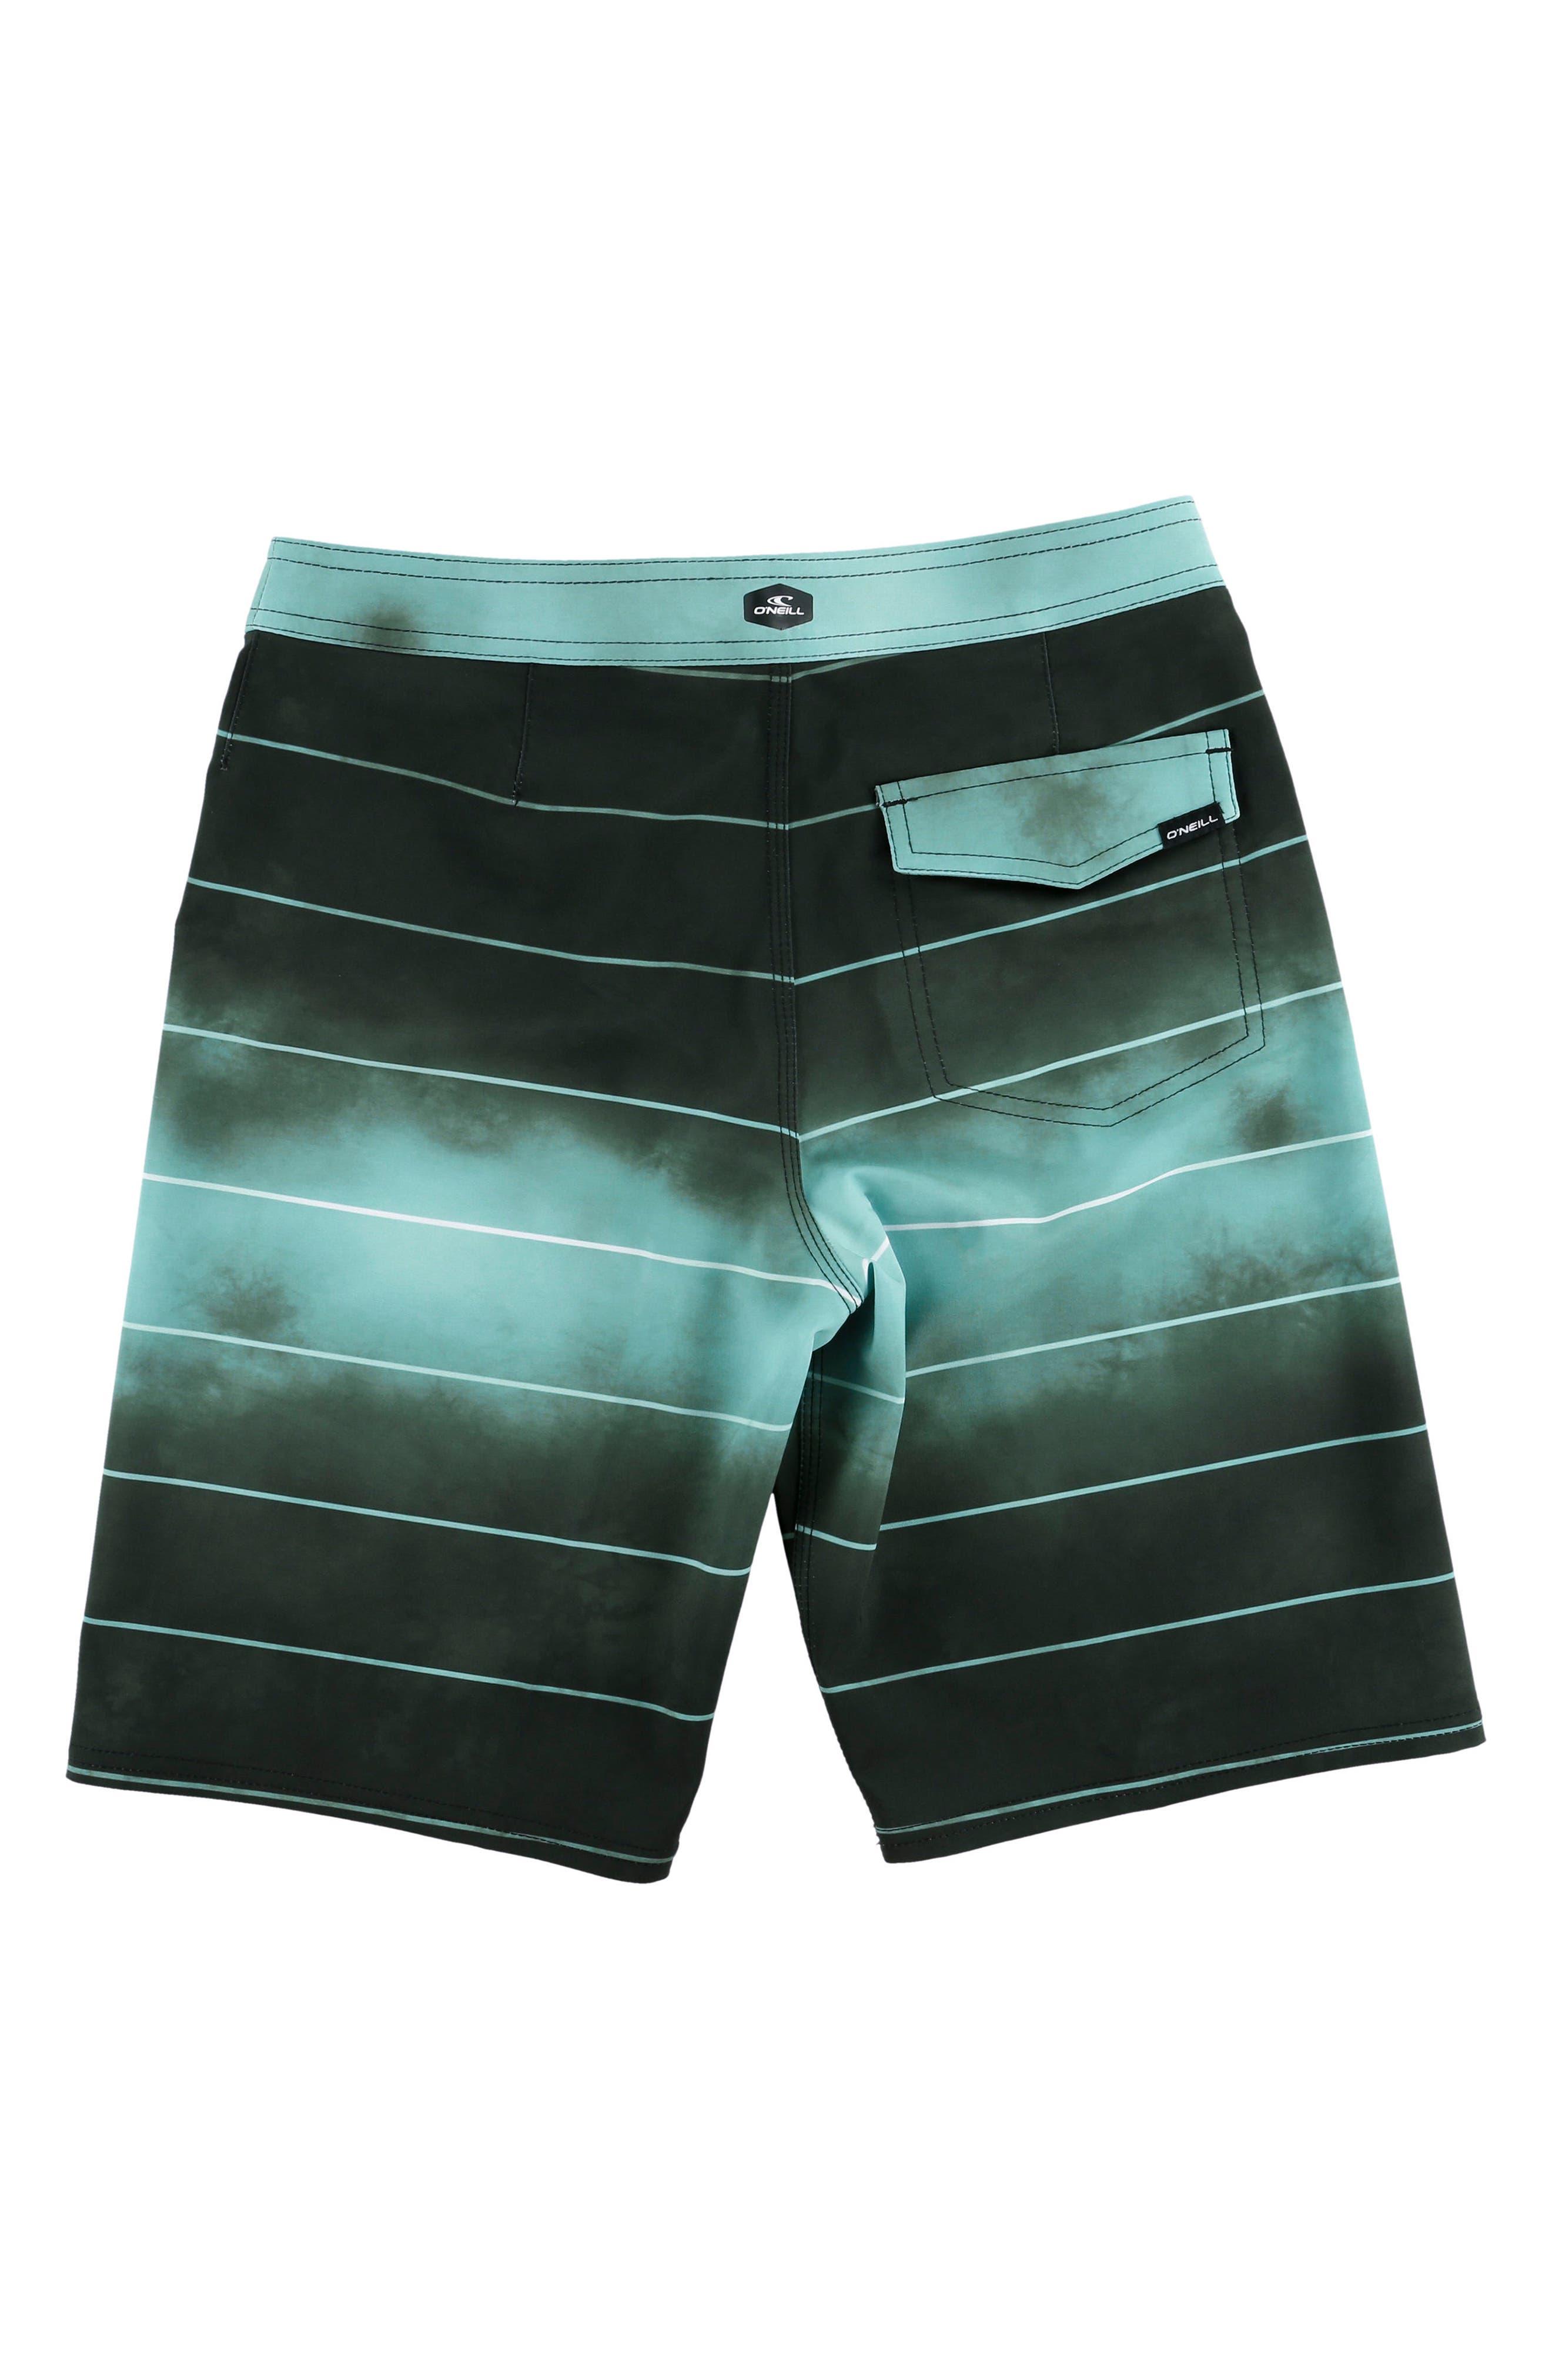 Hyperfreak Smokey Mirrors Board Shorts,                             Alternate thumbnail 2, color,                             Black